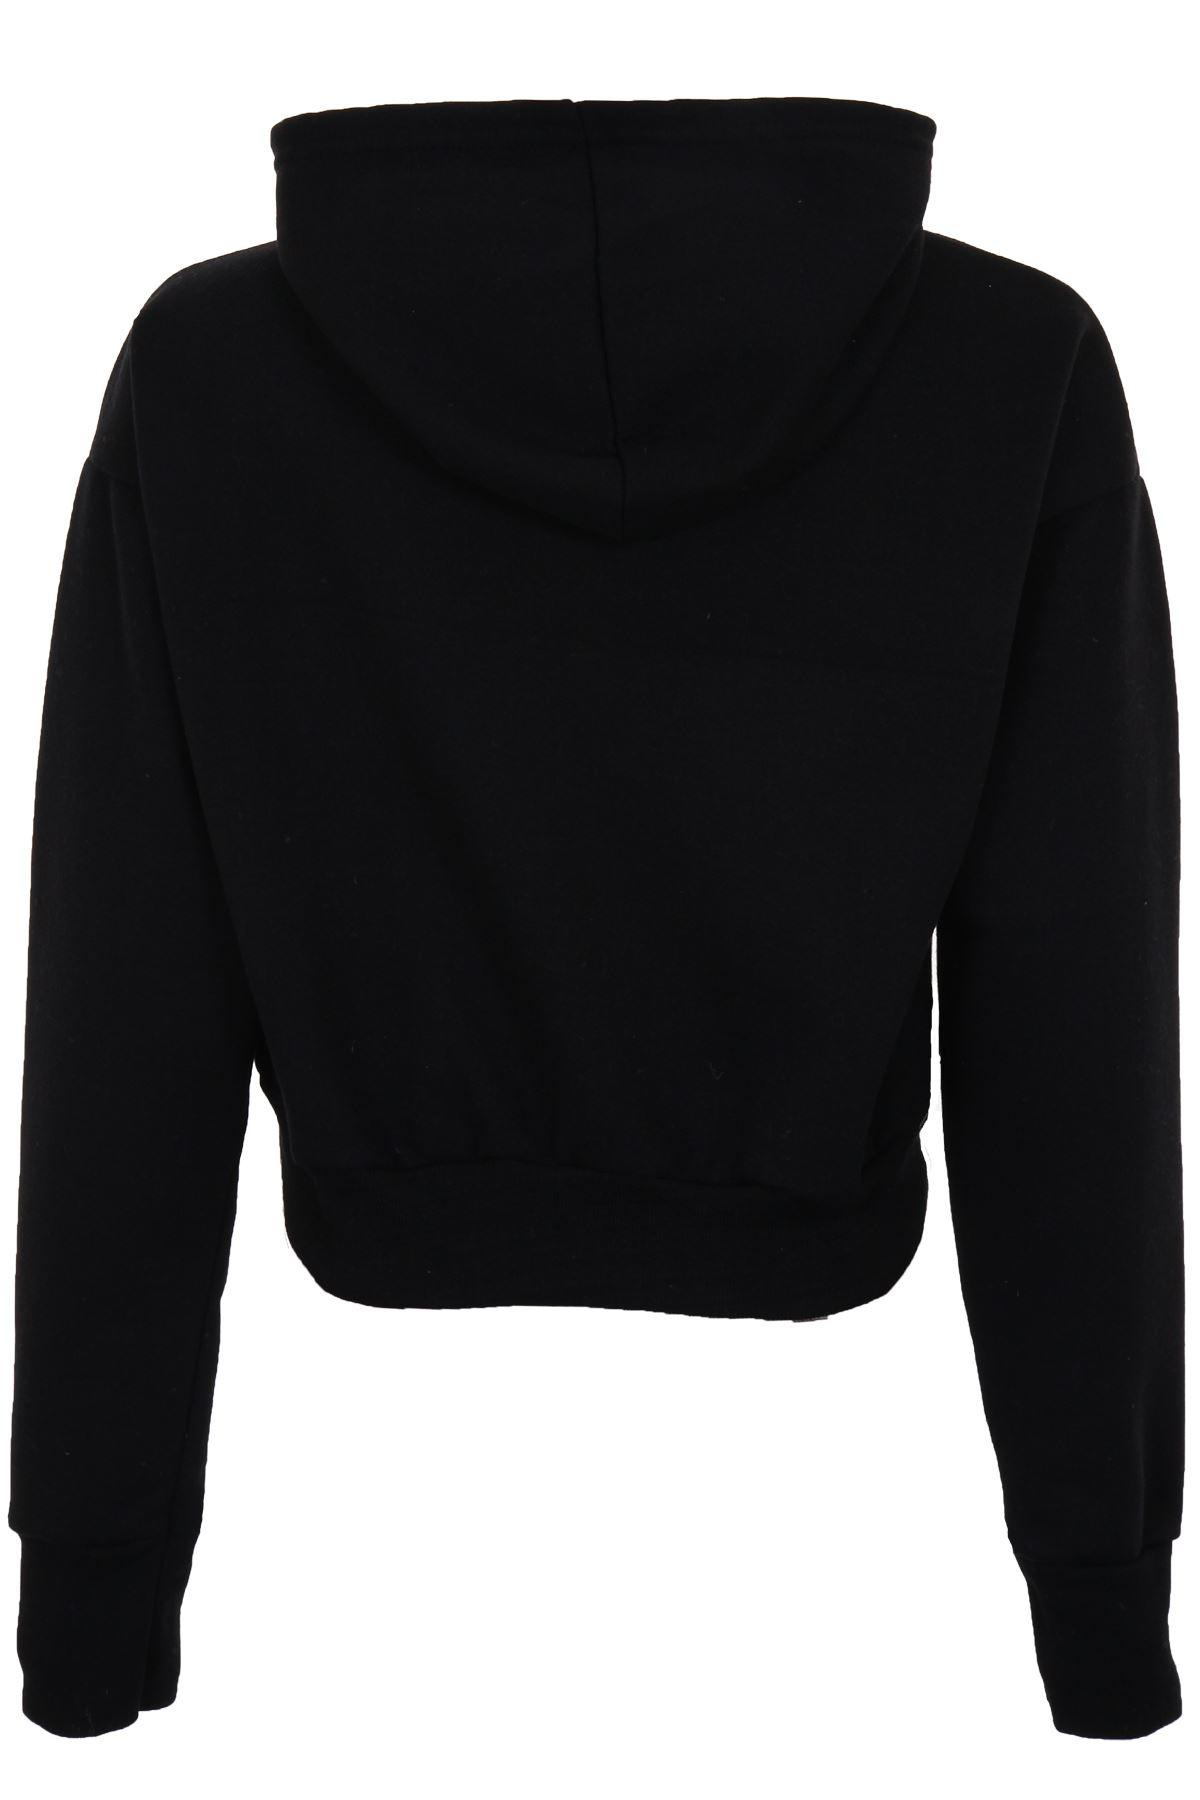 women 39 s crop top pull over hangover hoodie ladies hooded. Black Bedroom Furniture Sets. Home Design Ideas